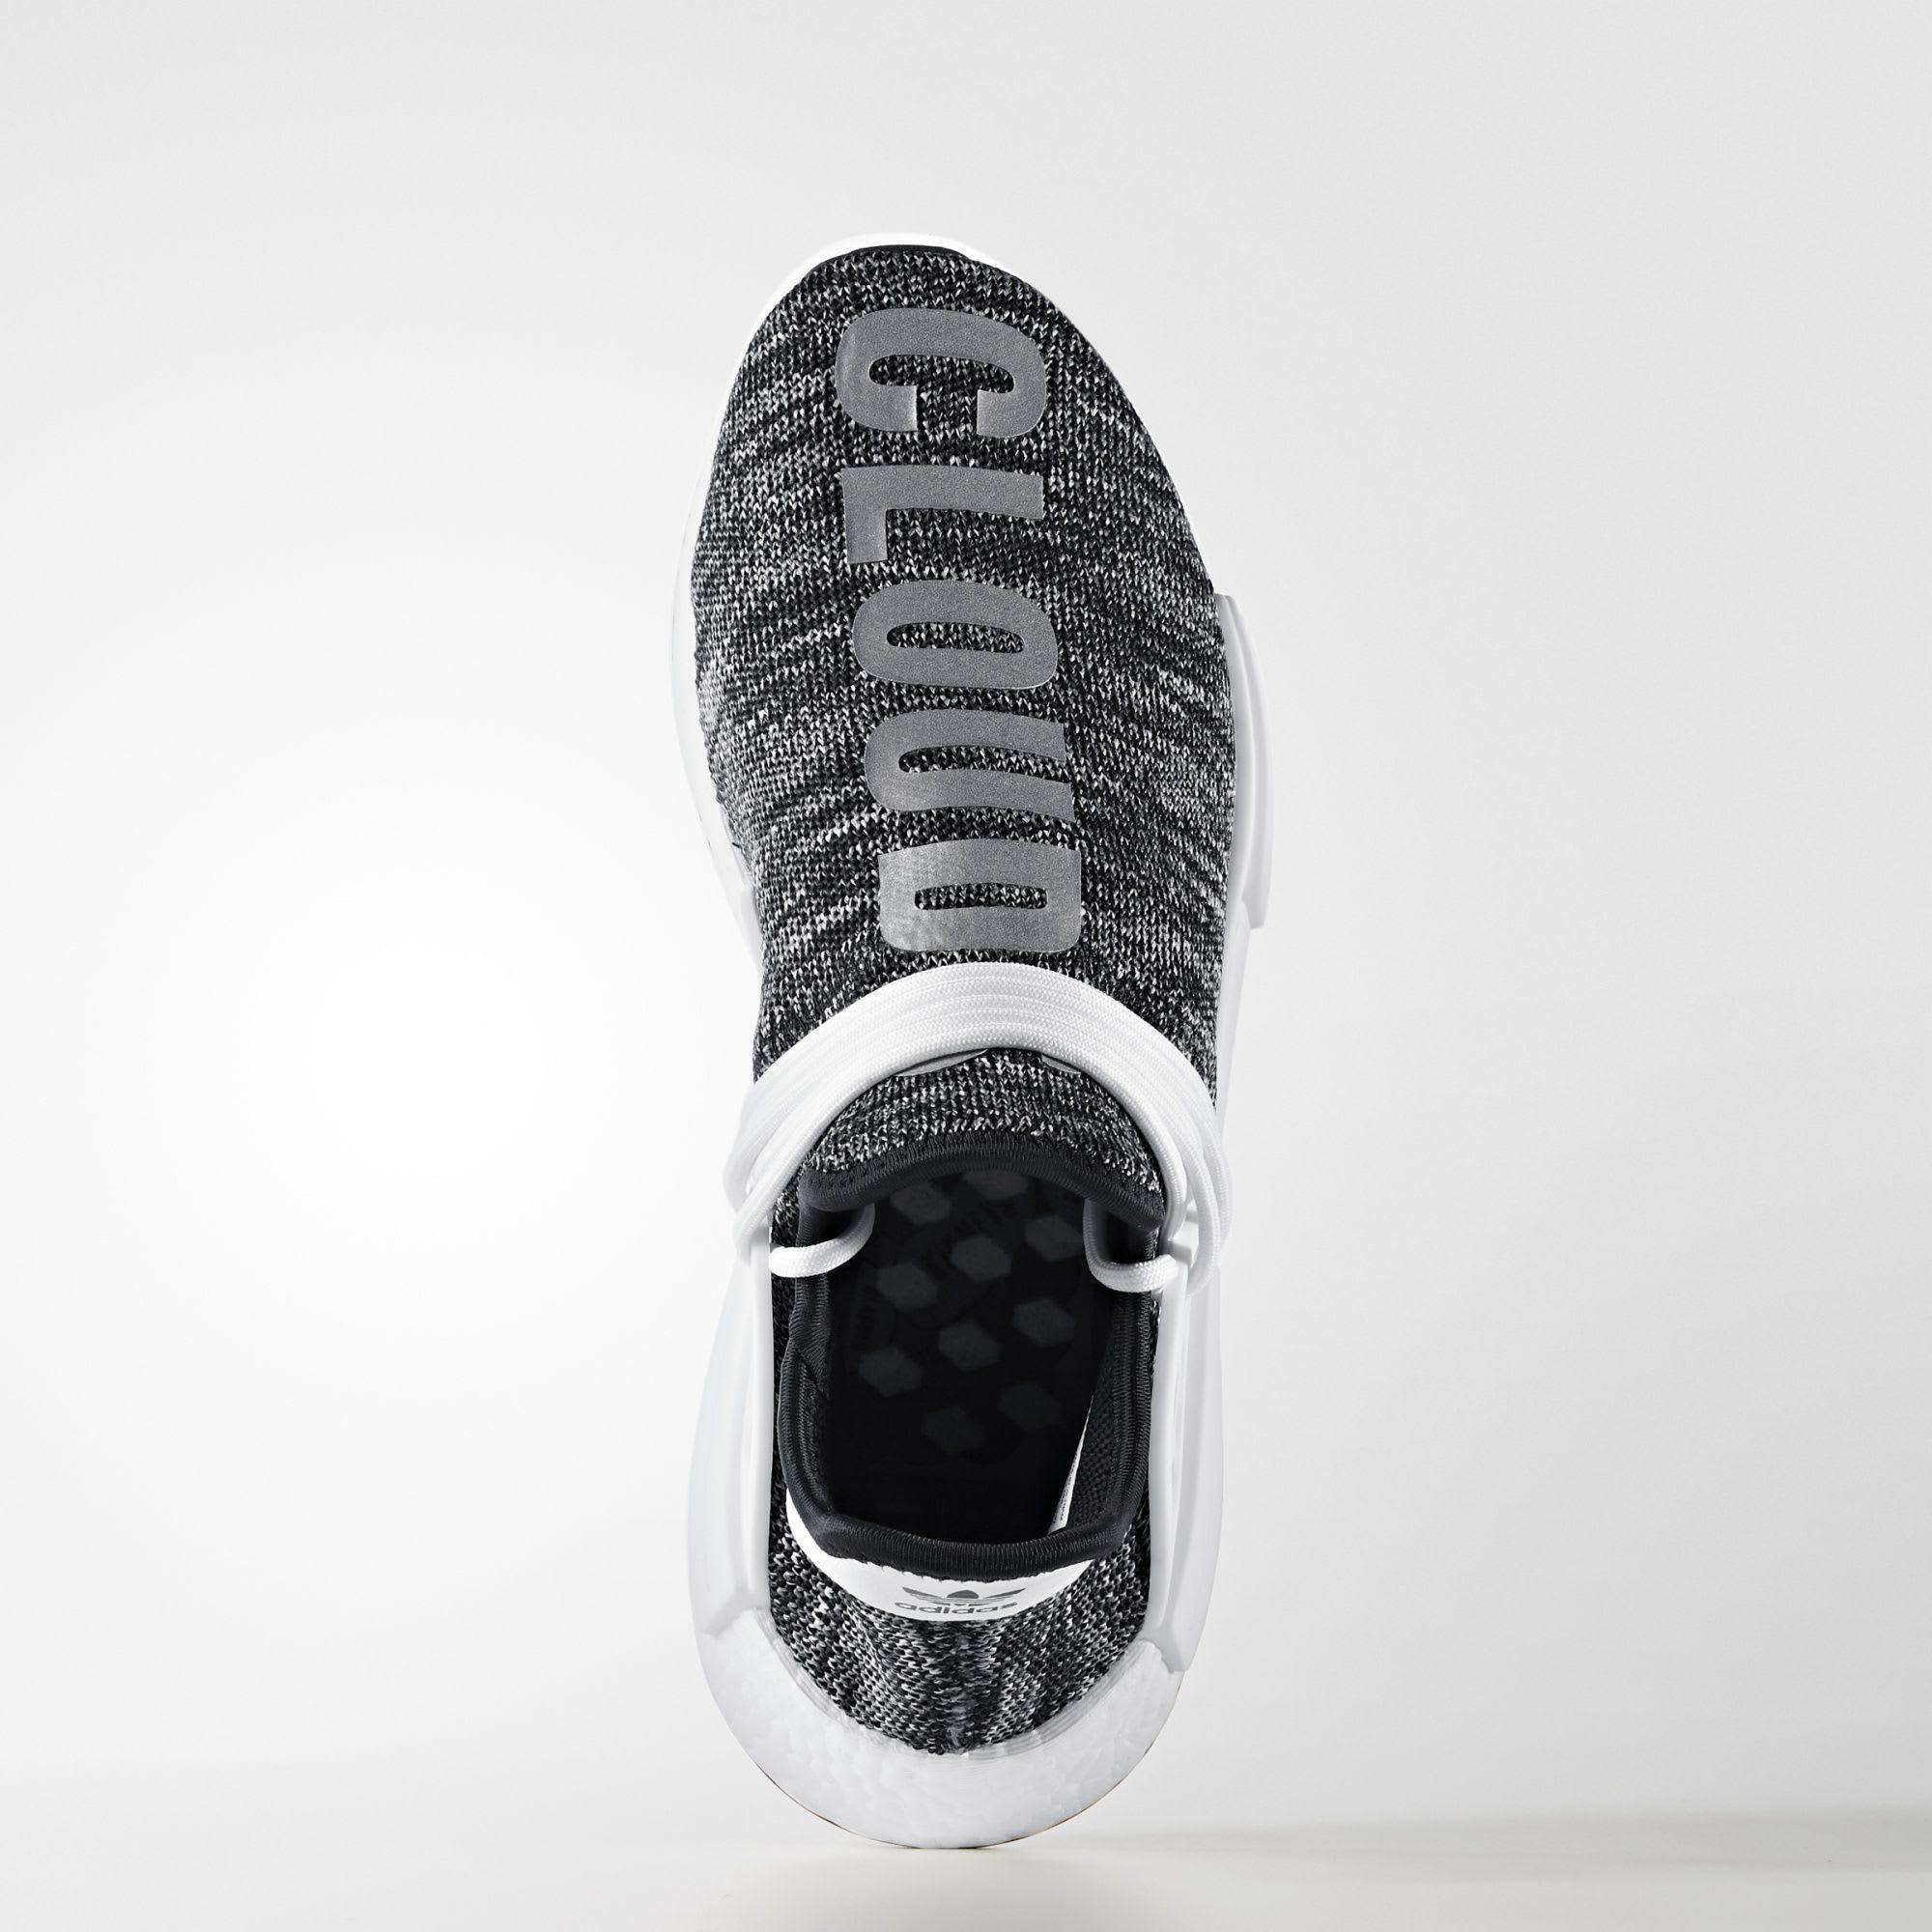 69c988f643f5 Adidas x Pharrell Williams NMD HU Trail (Pale Nude End Clothing